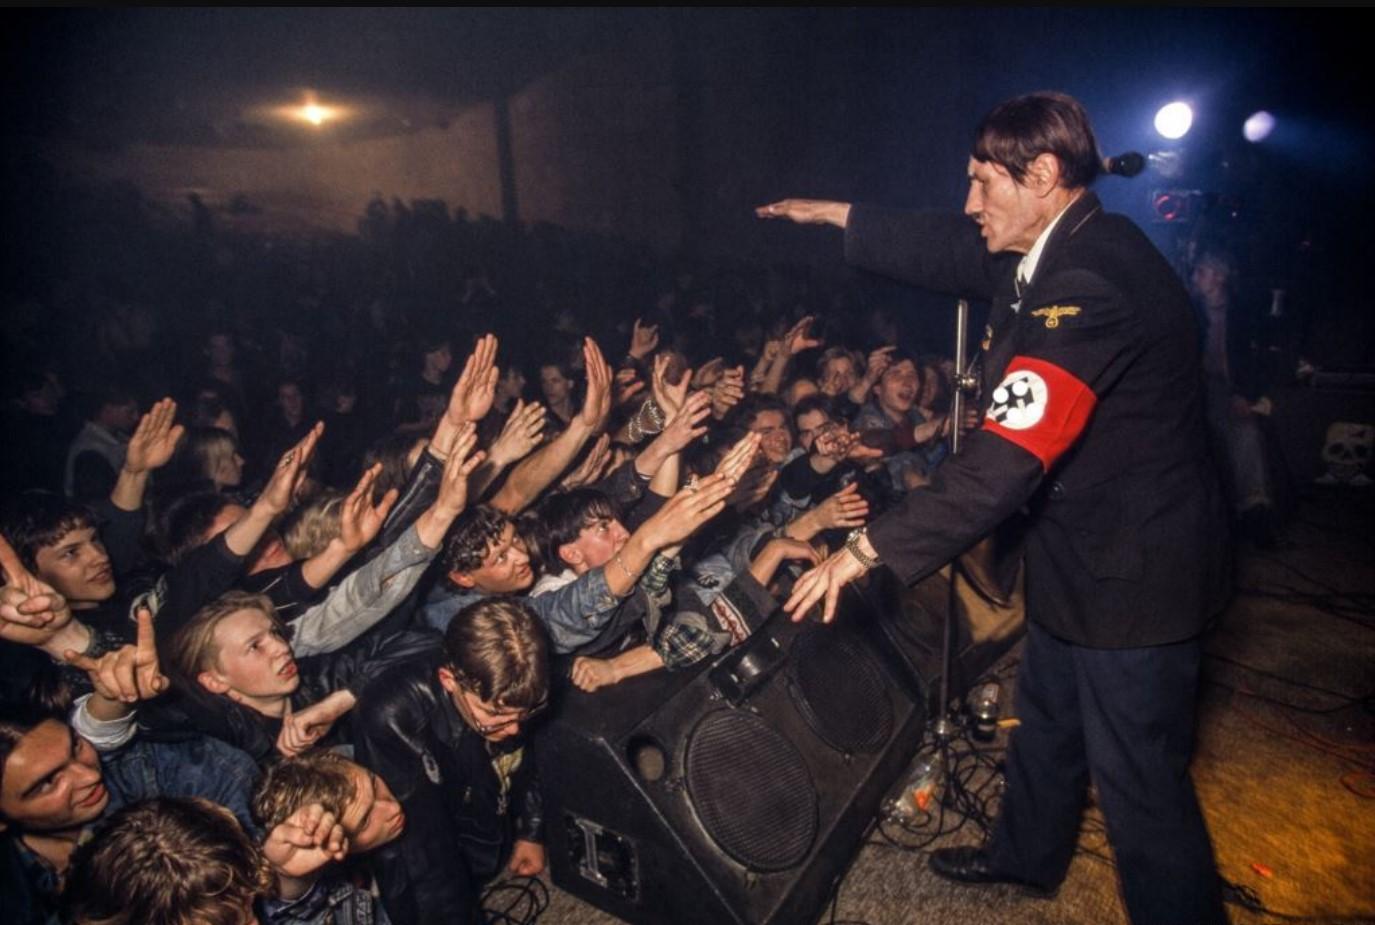 Фанаты приветствуют двойника Гитлера на концерте «Коррозии металла»